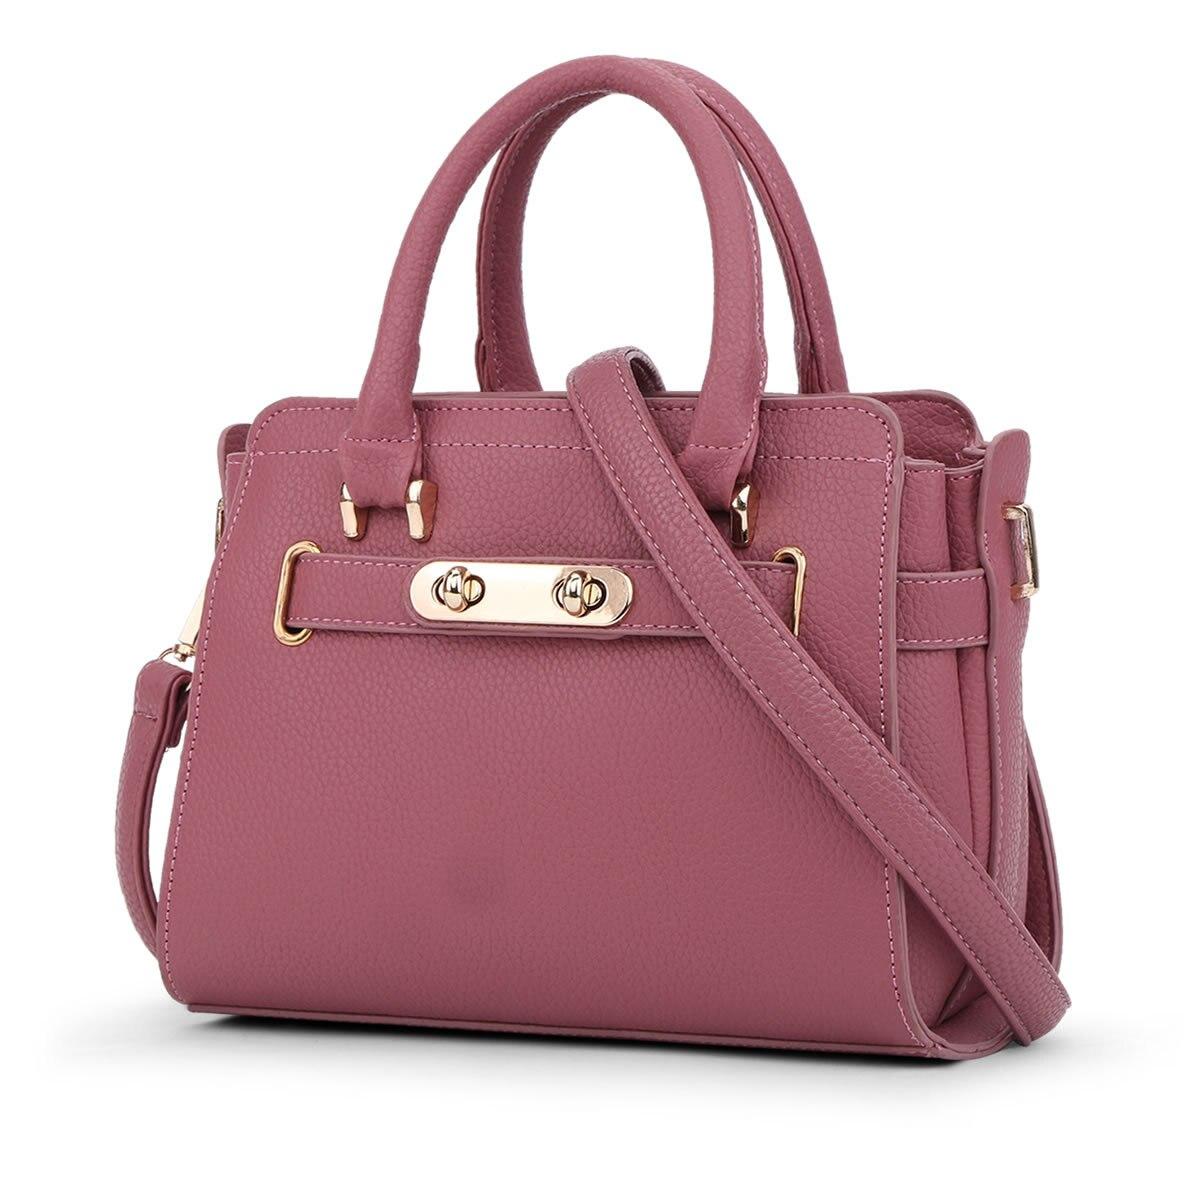 ФОТО New 2017 Women Leather Shoulder Bag Shell Bags Casual Handbags Pink Messenger Bag SMYYG-A0114